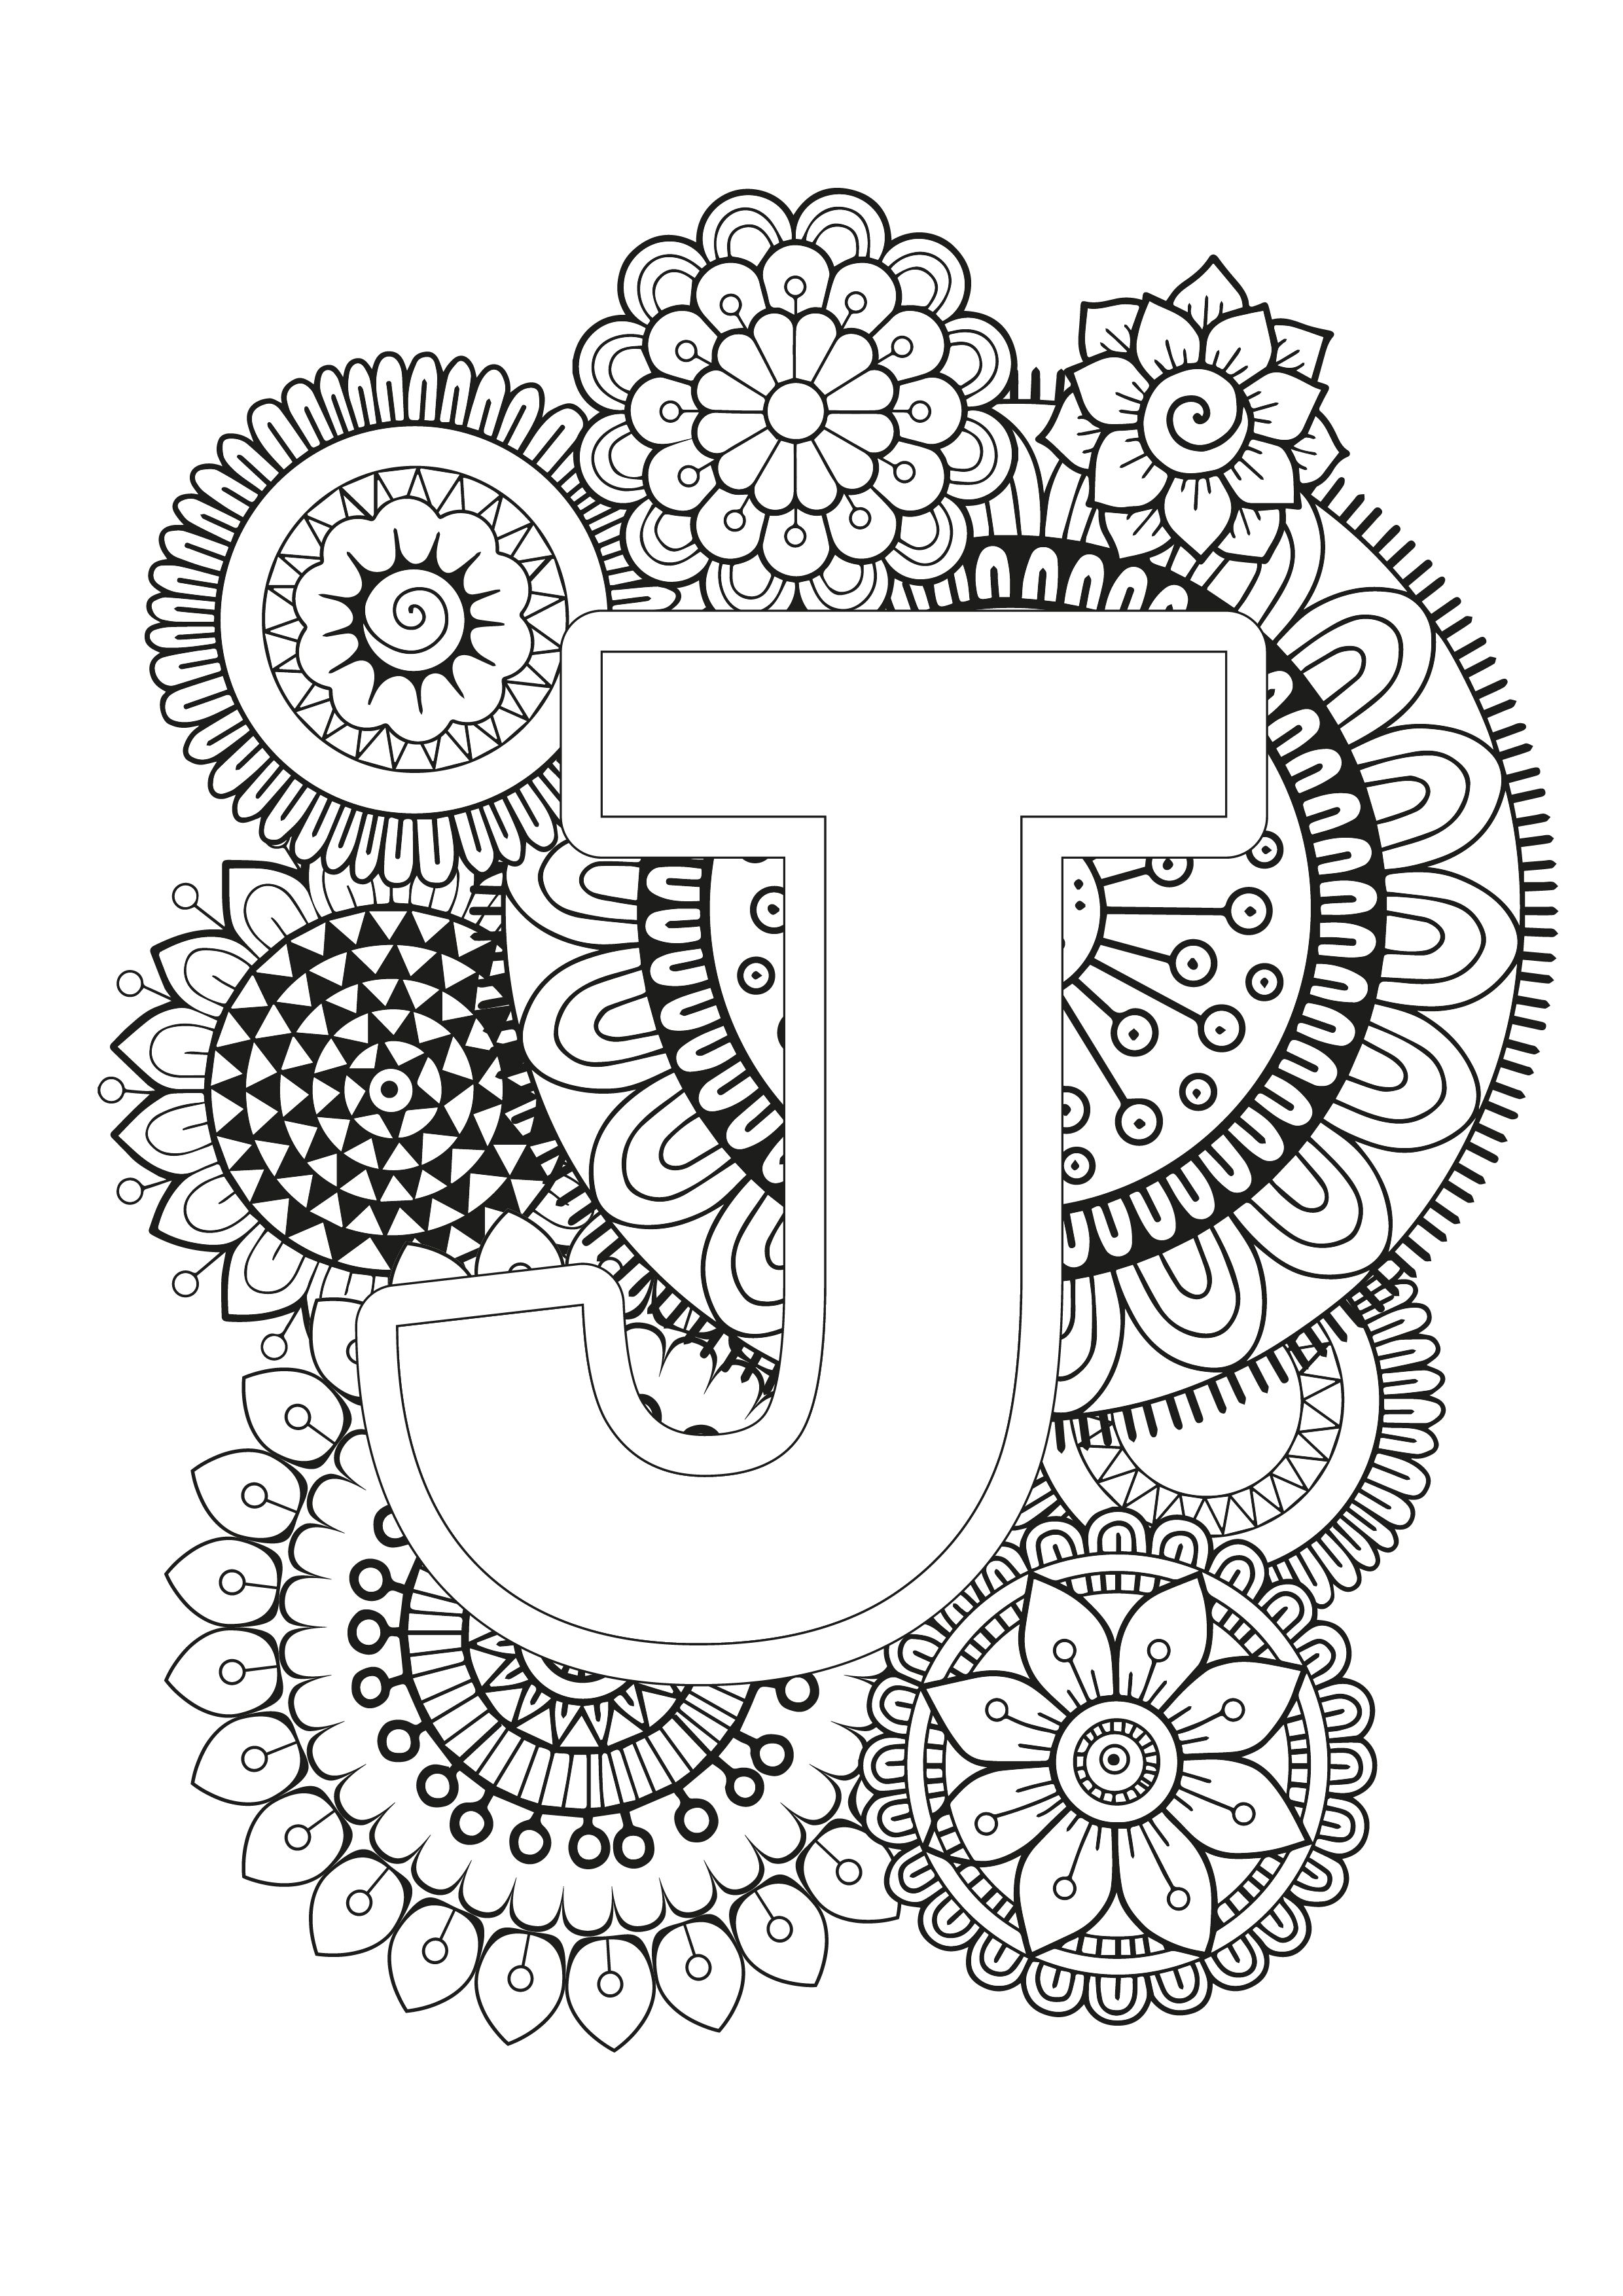 Mindfulness Coloring Page - Alphabet | Mandala coloring ...